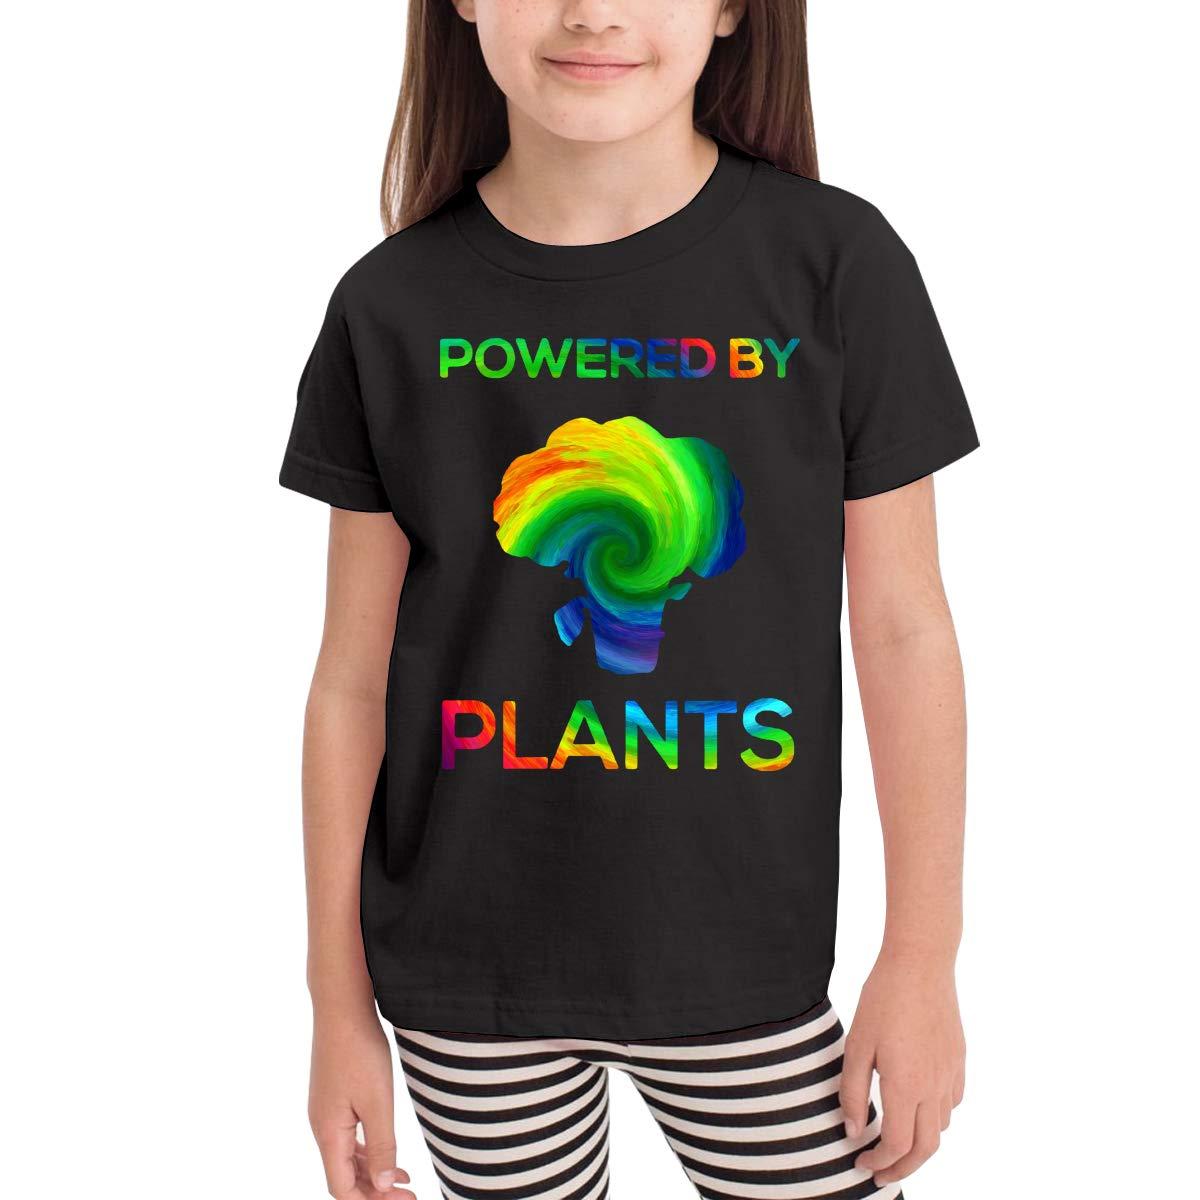 Kids T-Shirt Tops Black Powered by Plants Vegan 3D Printing Unisex Youths Short Sleeve T-Shirt